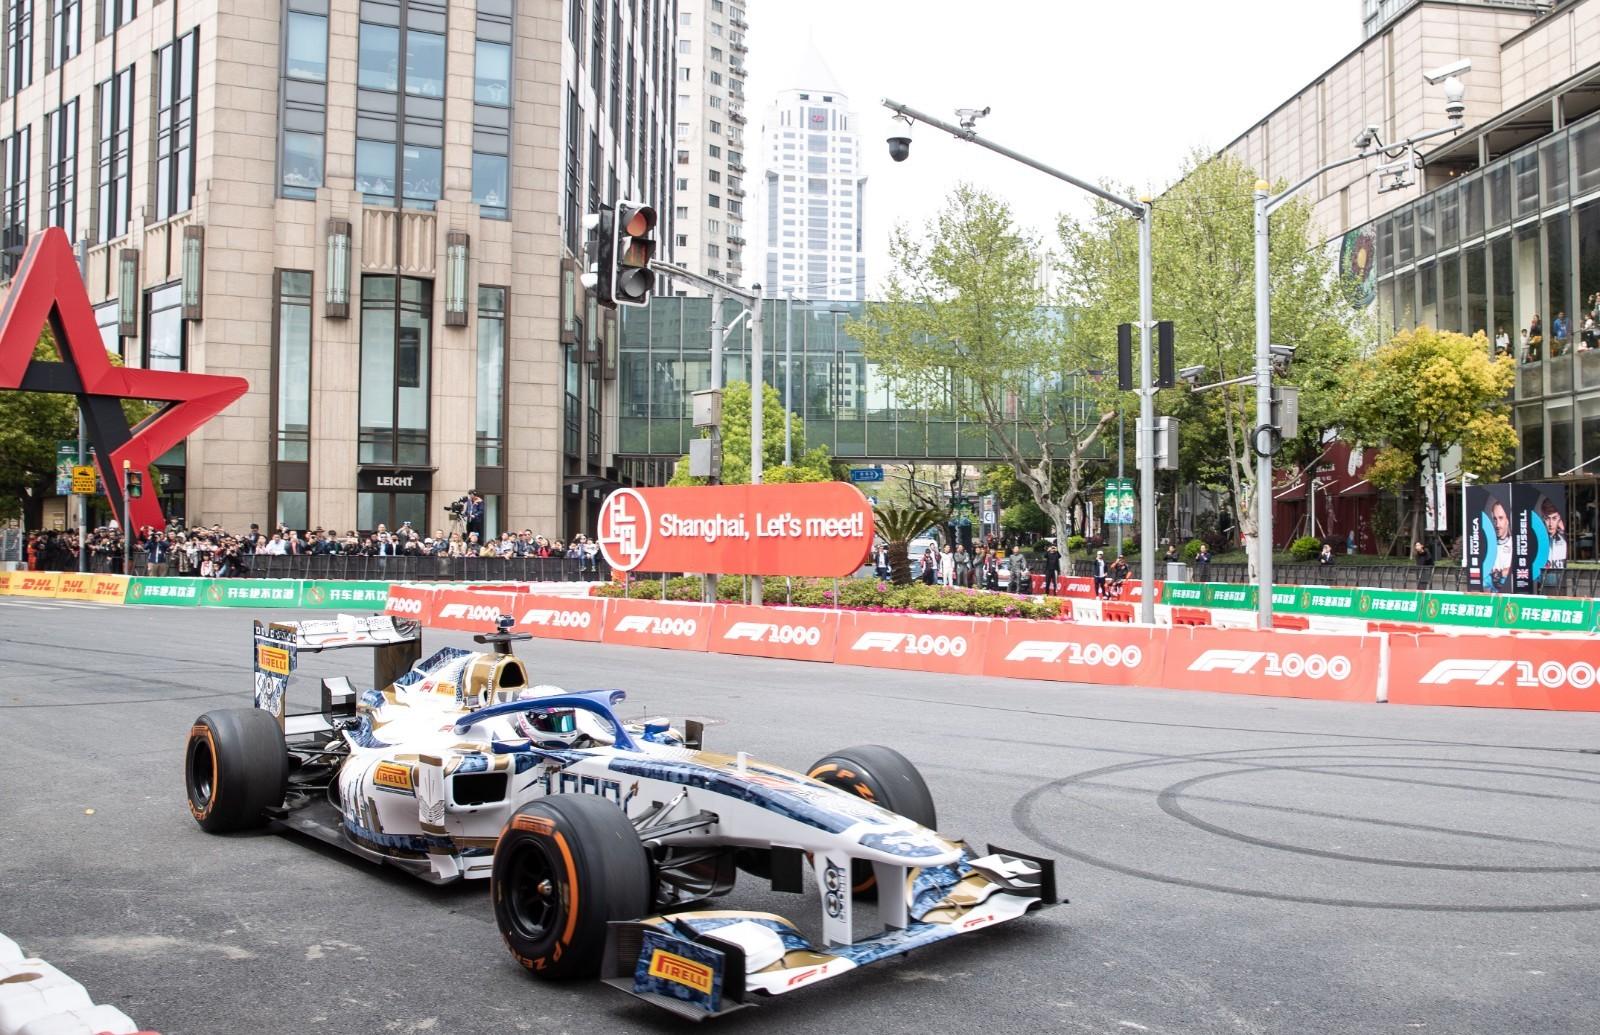 F1赛车首次在上海街头表演 周冠宇驾驶雷诺驰骋新天地